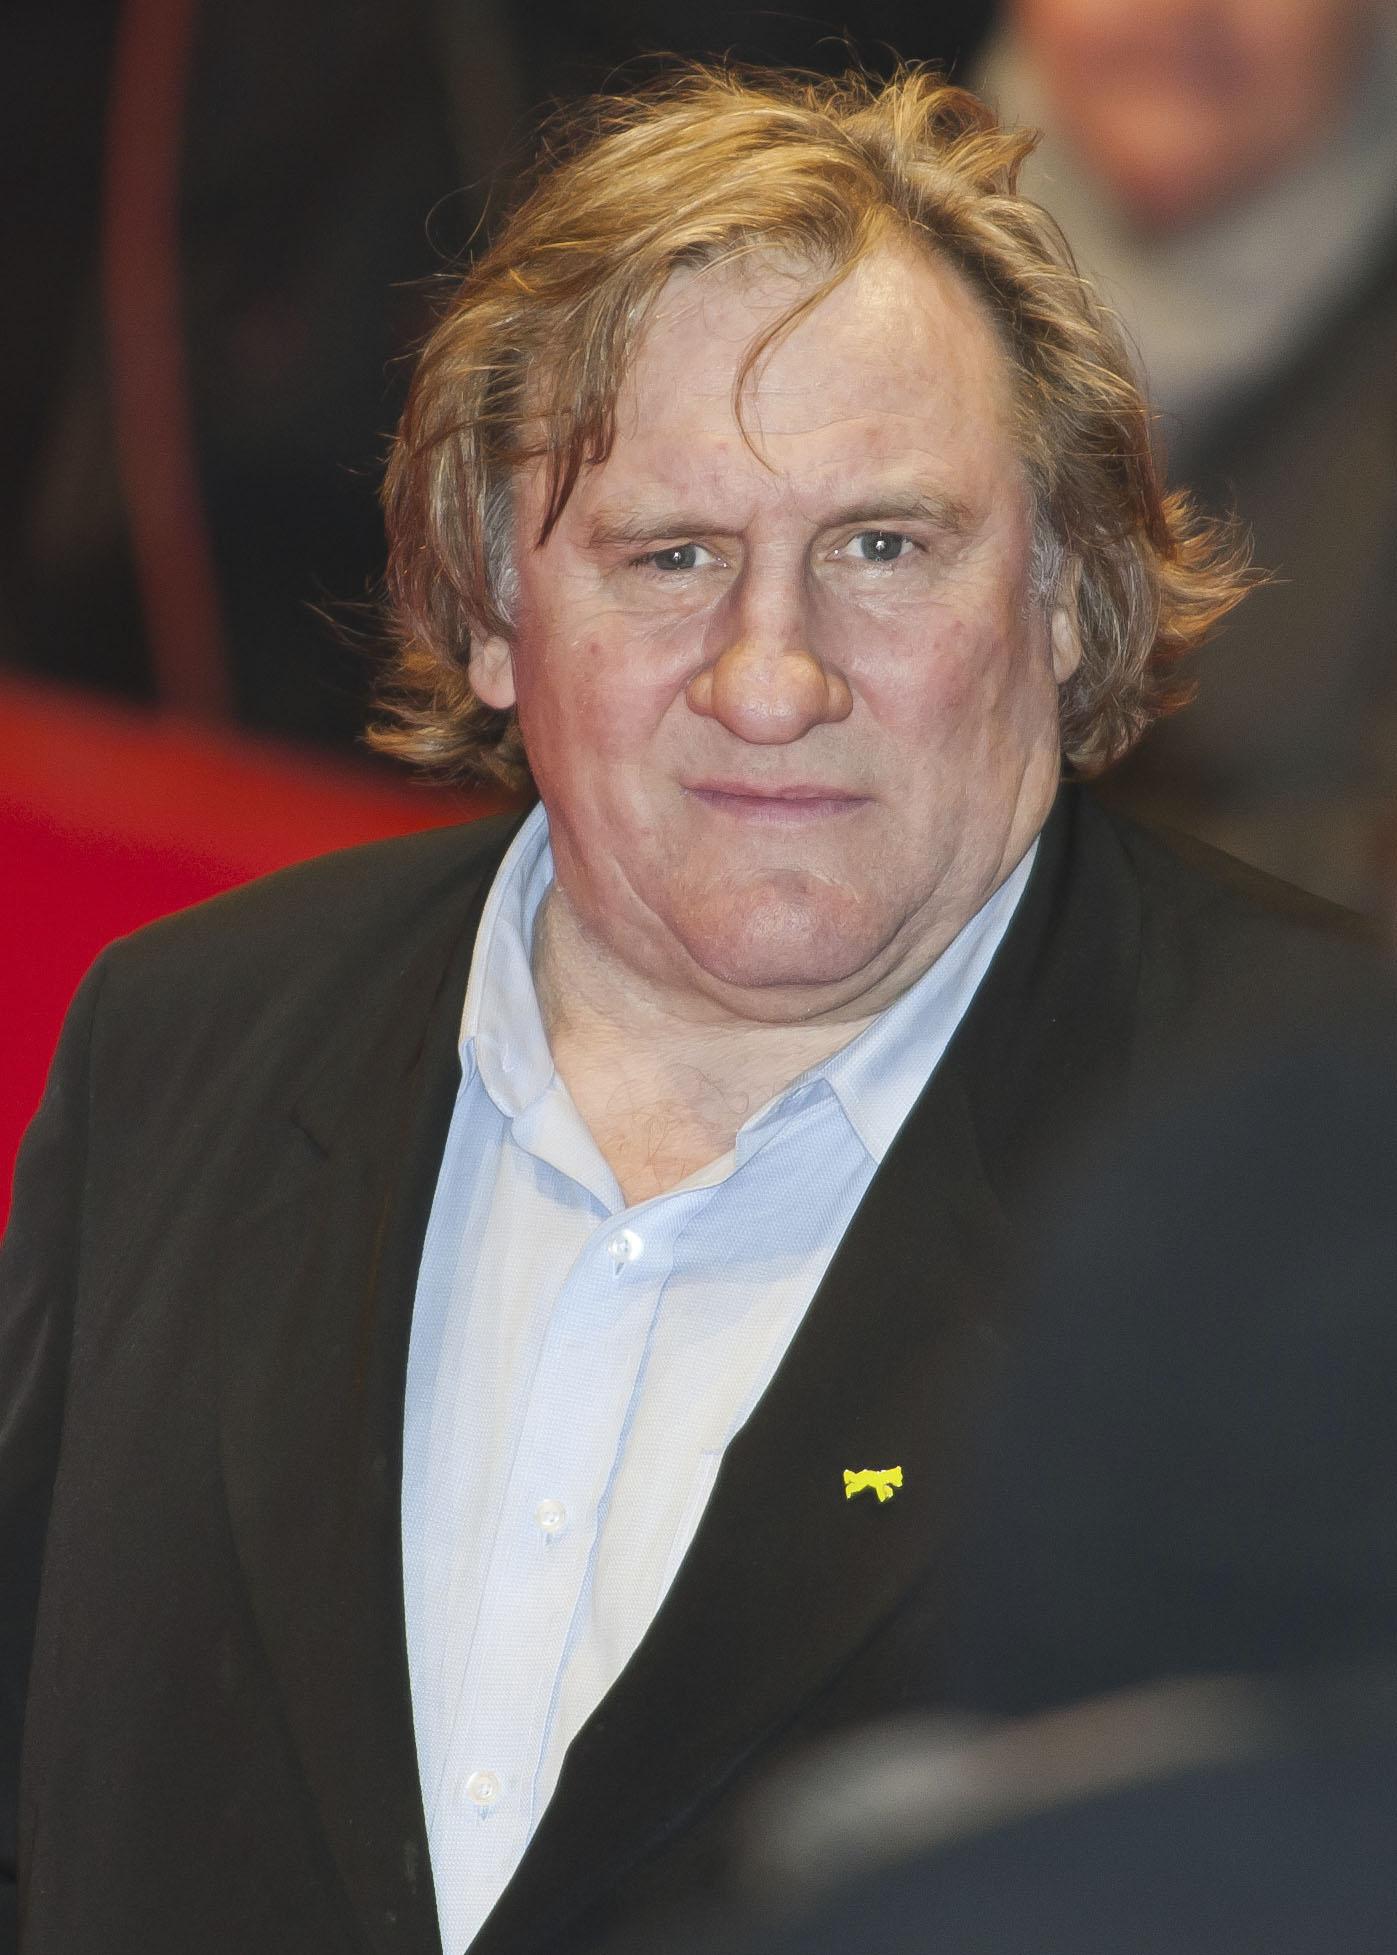 Gerard Depardieu Wiki